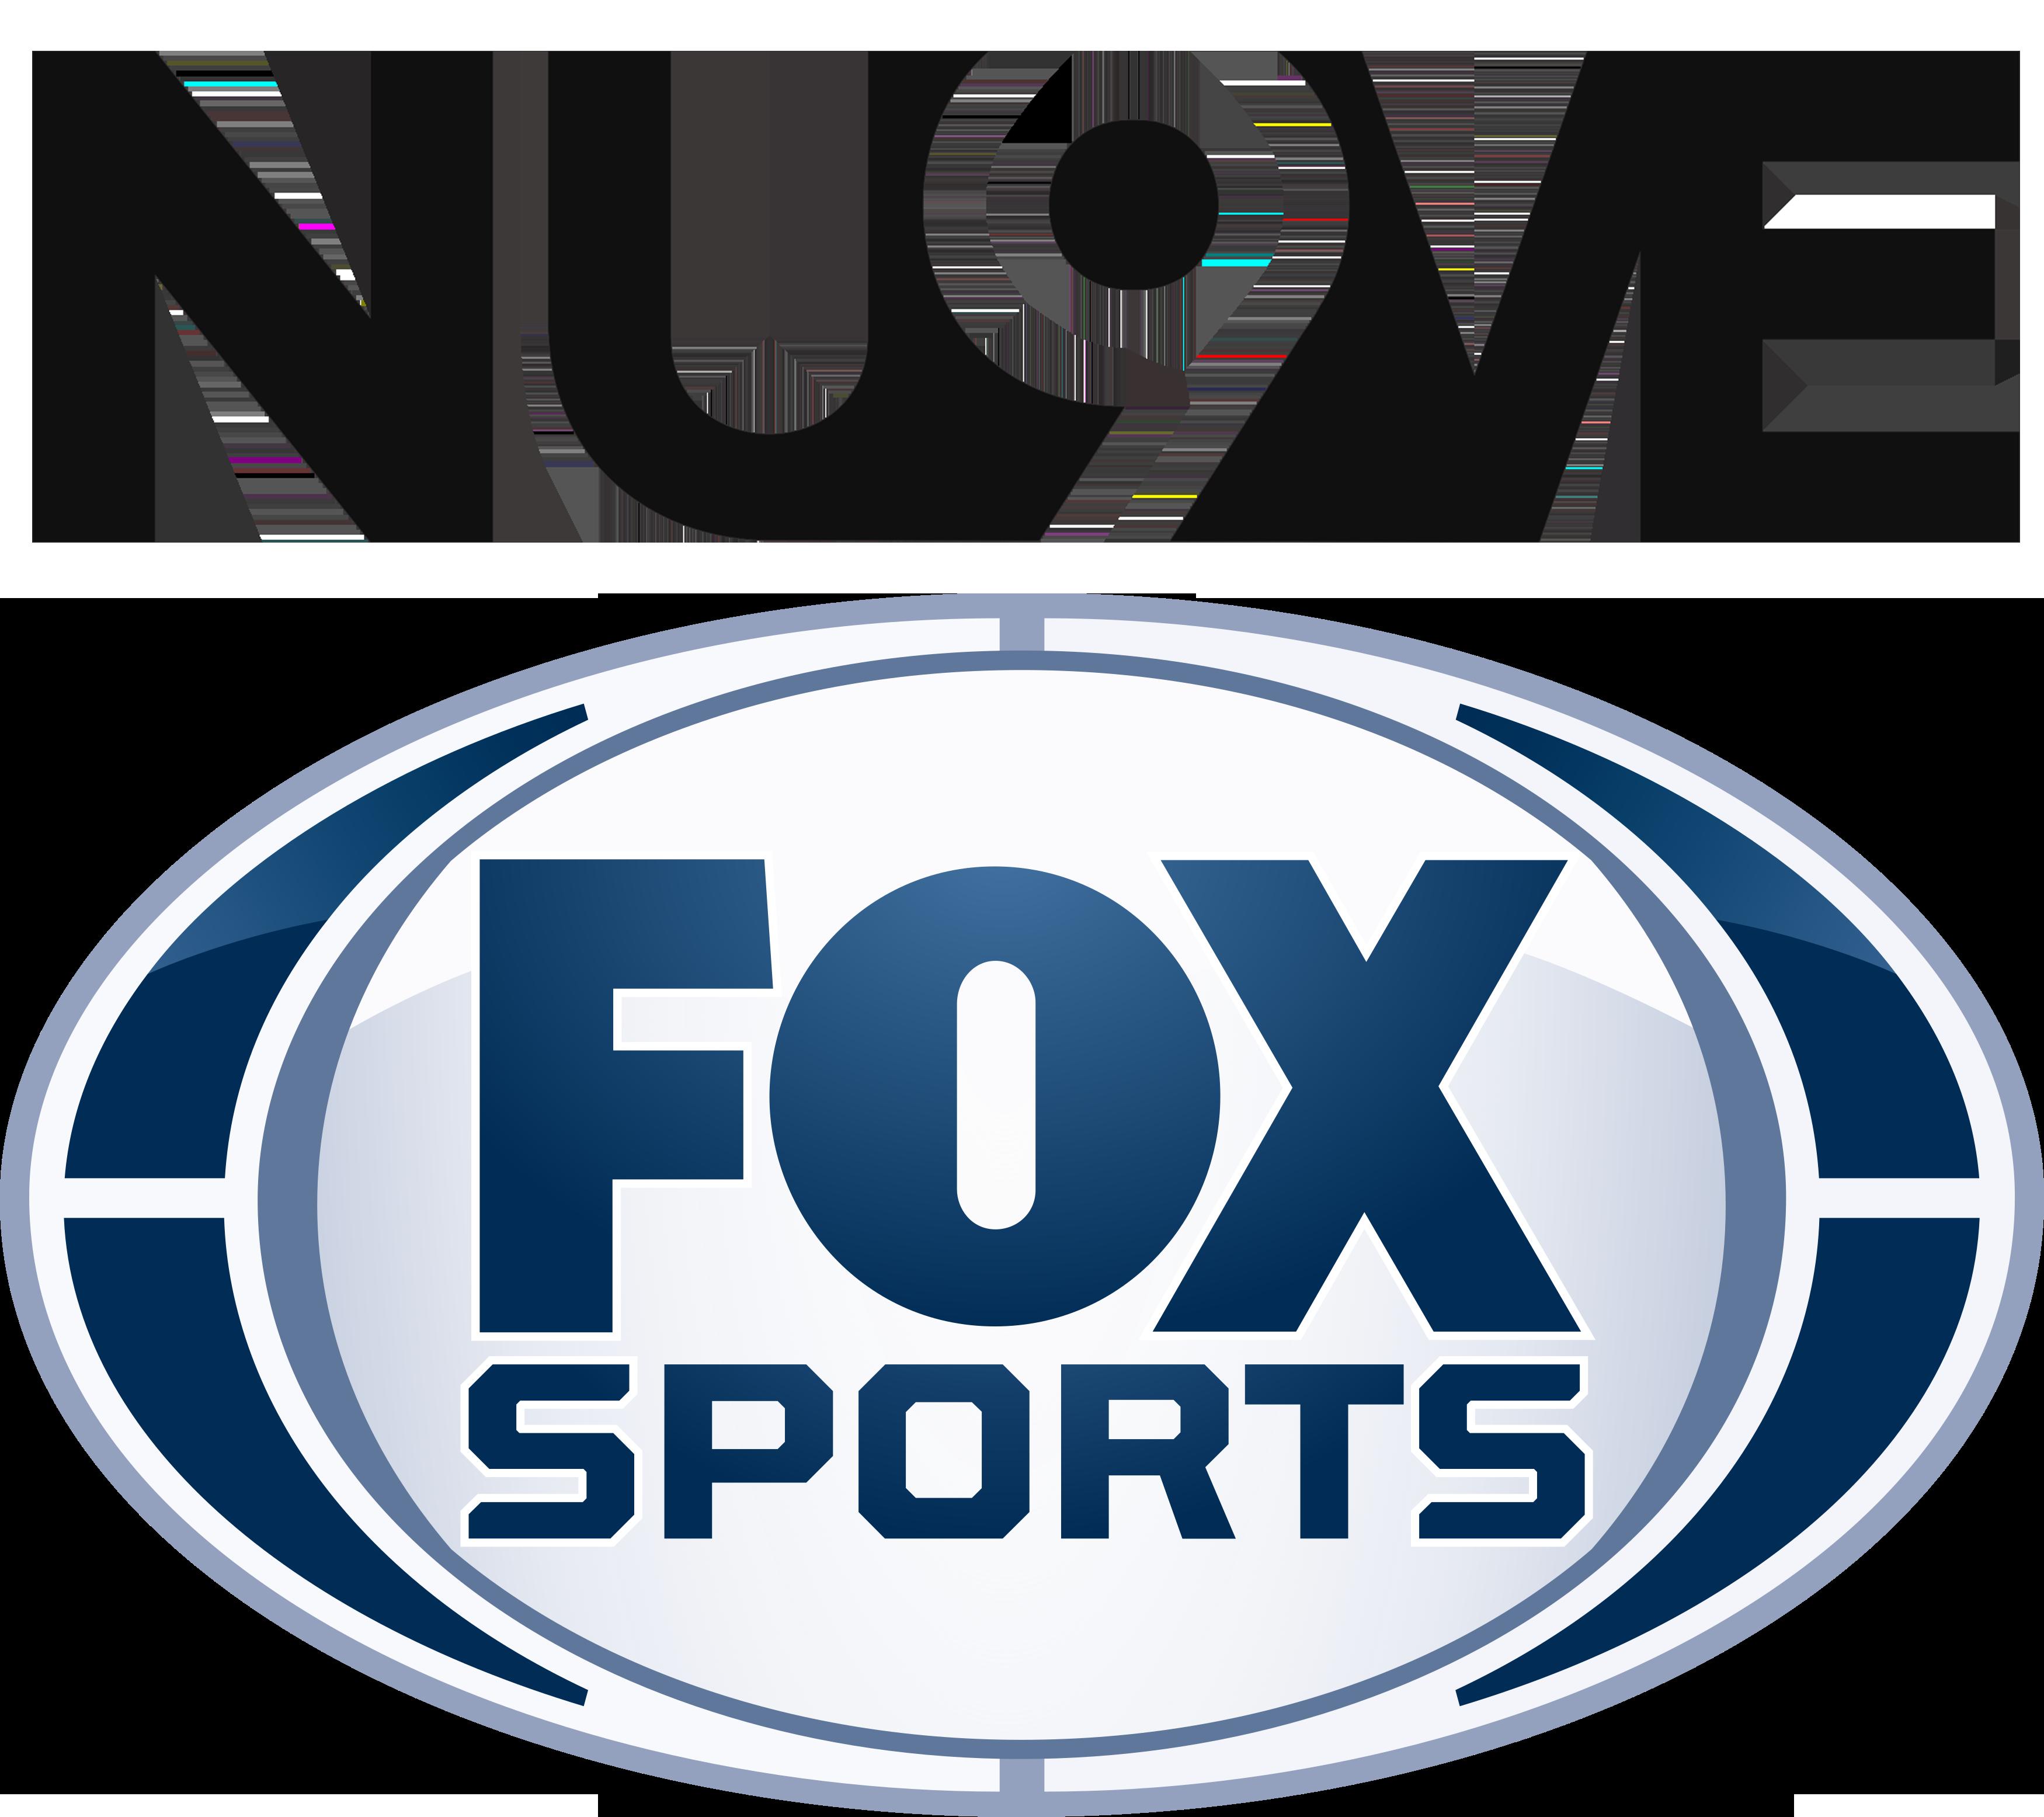 Nueve   Fox Sports